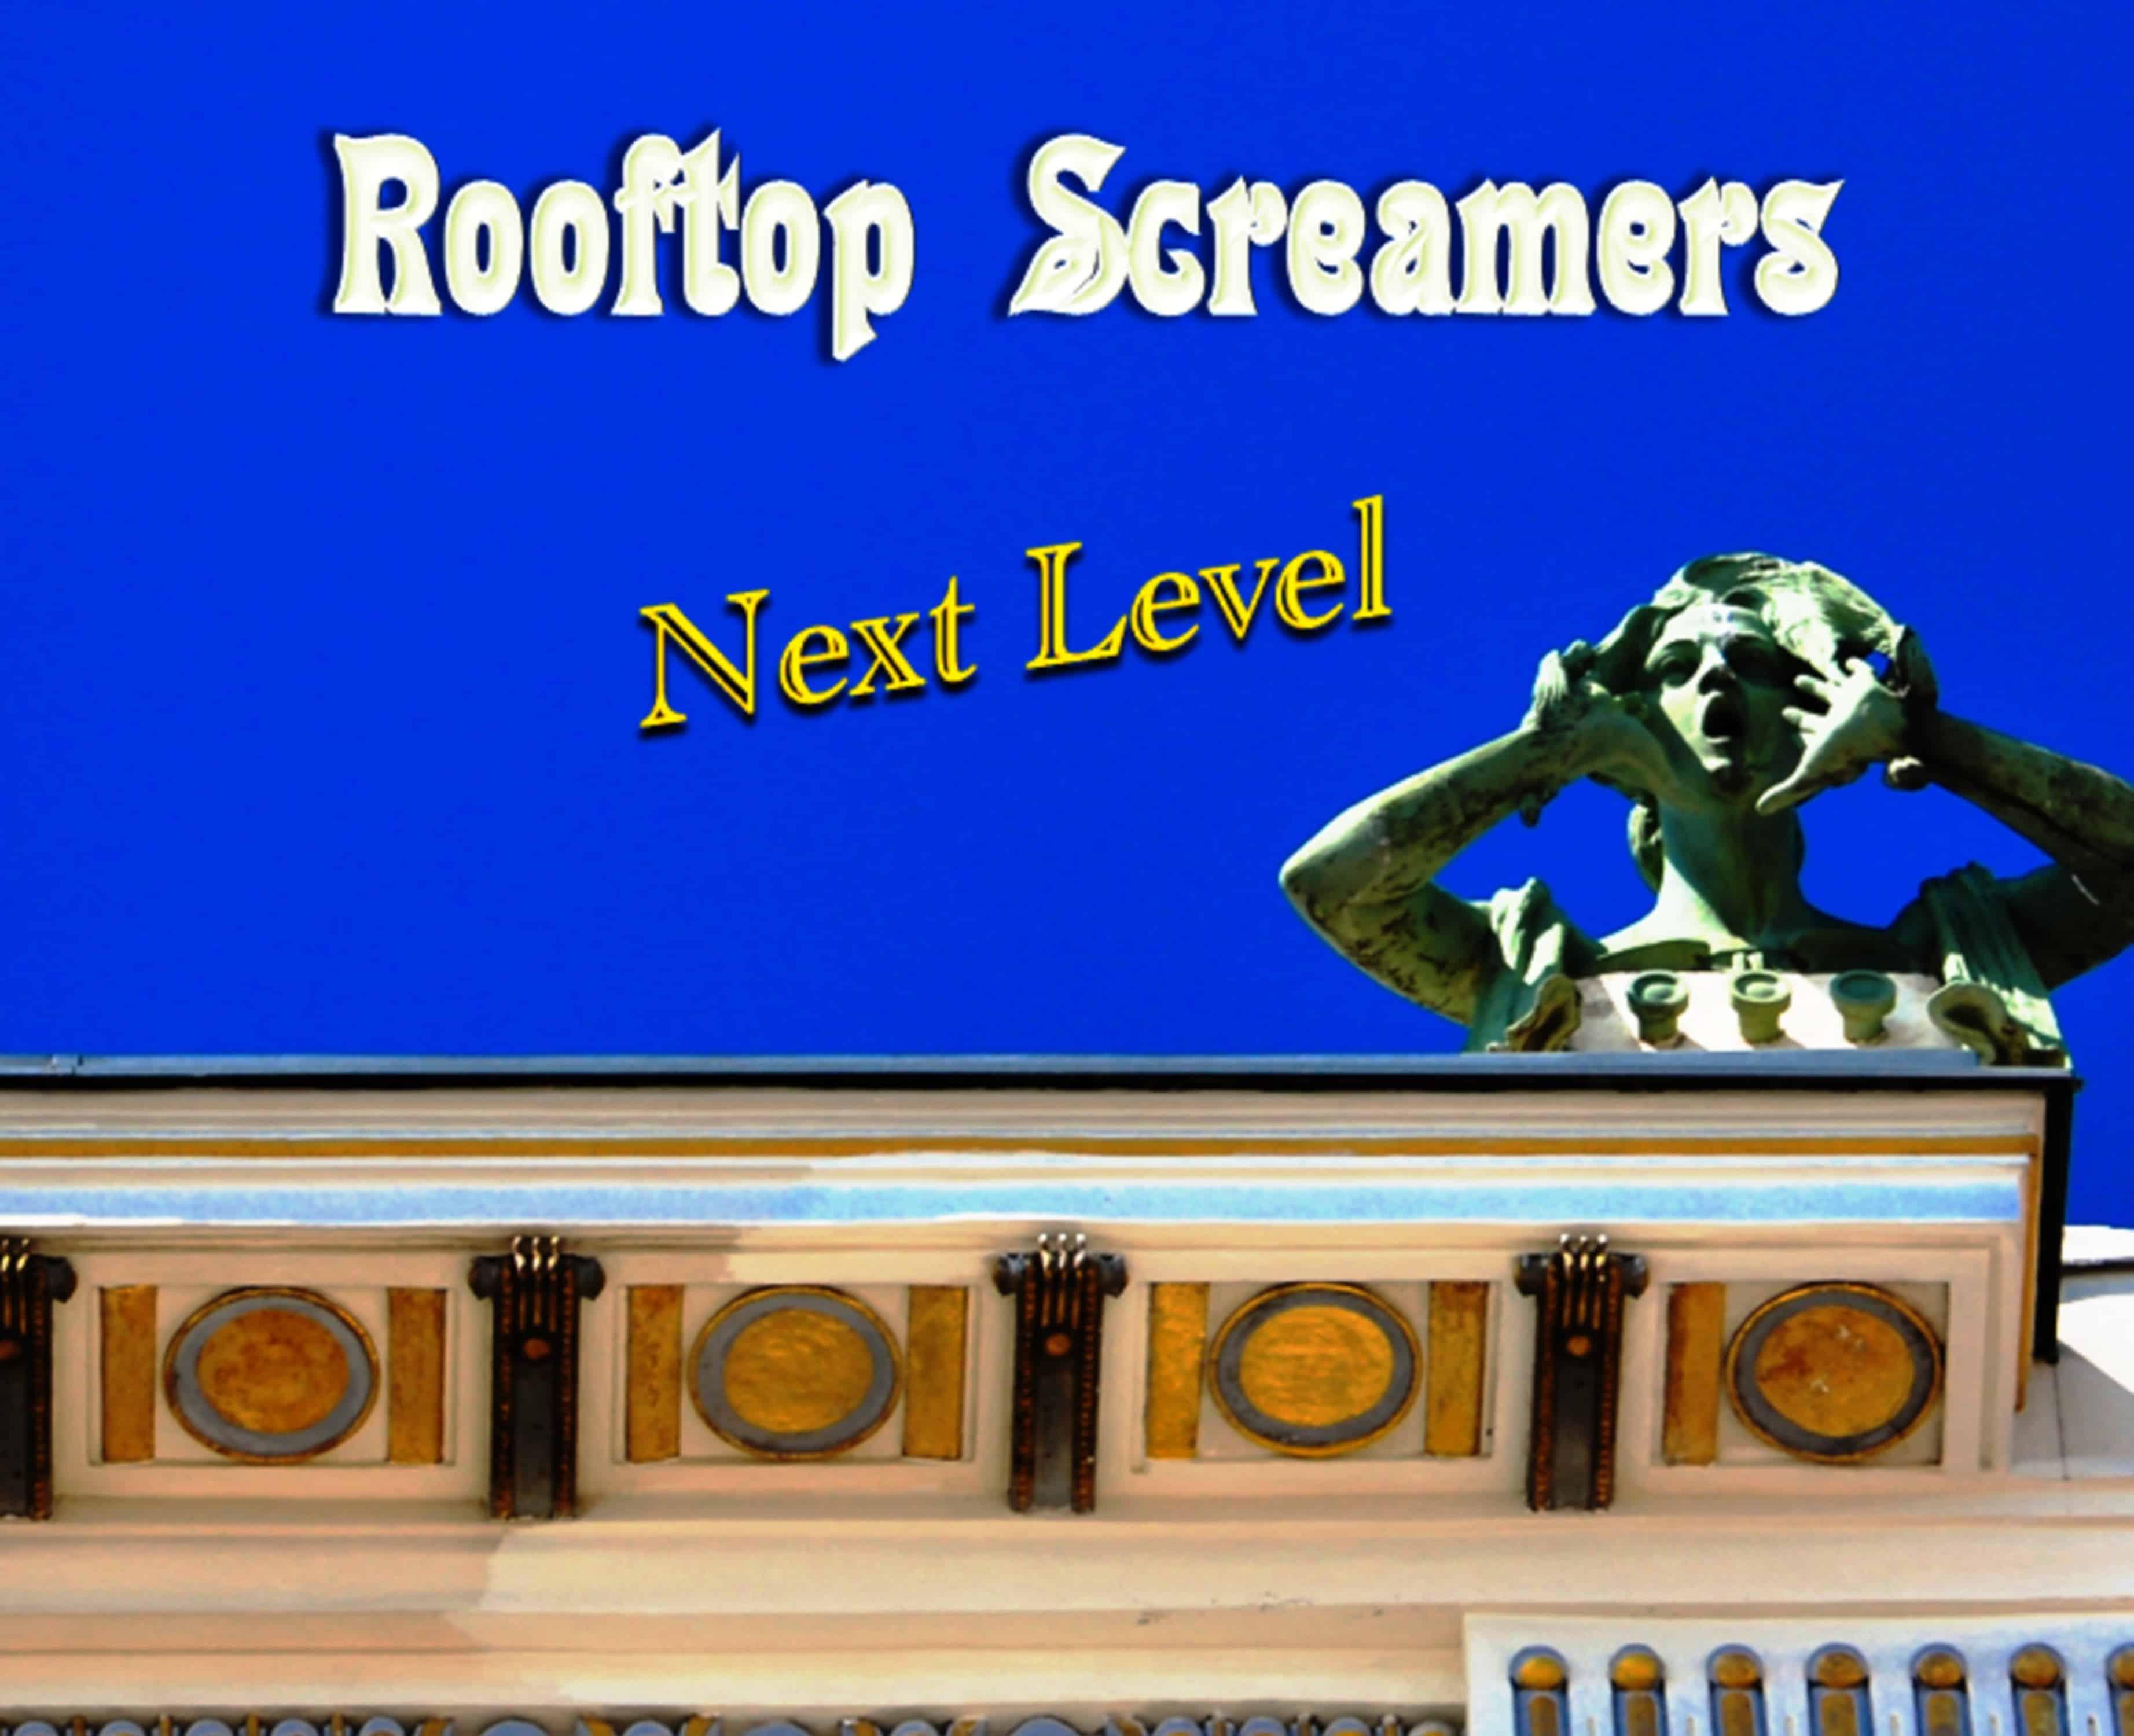 Rooftop Screamers - Next Level album cover